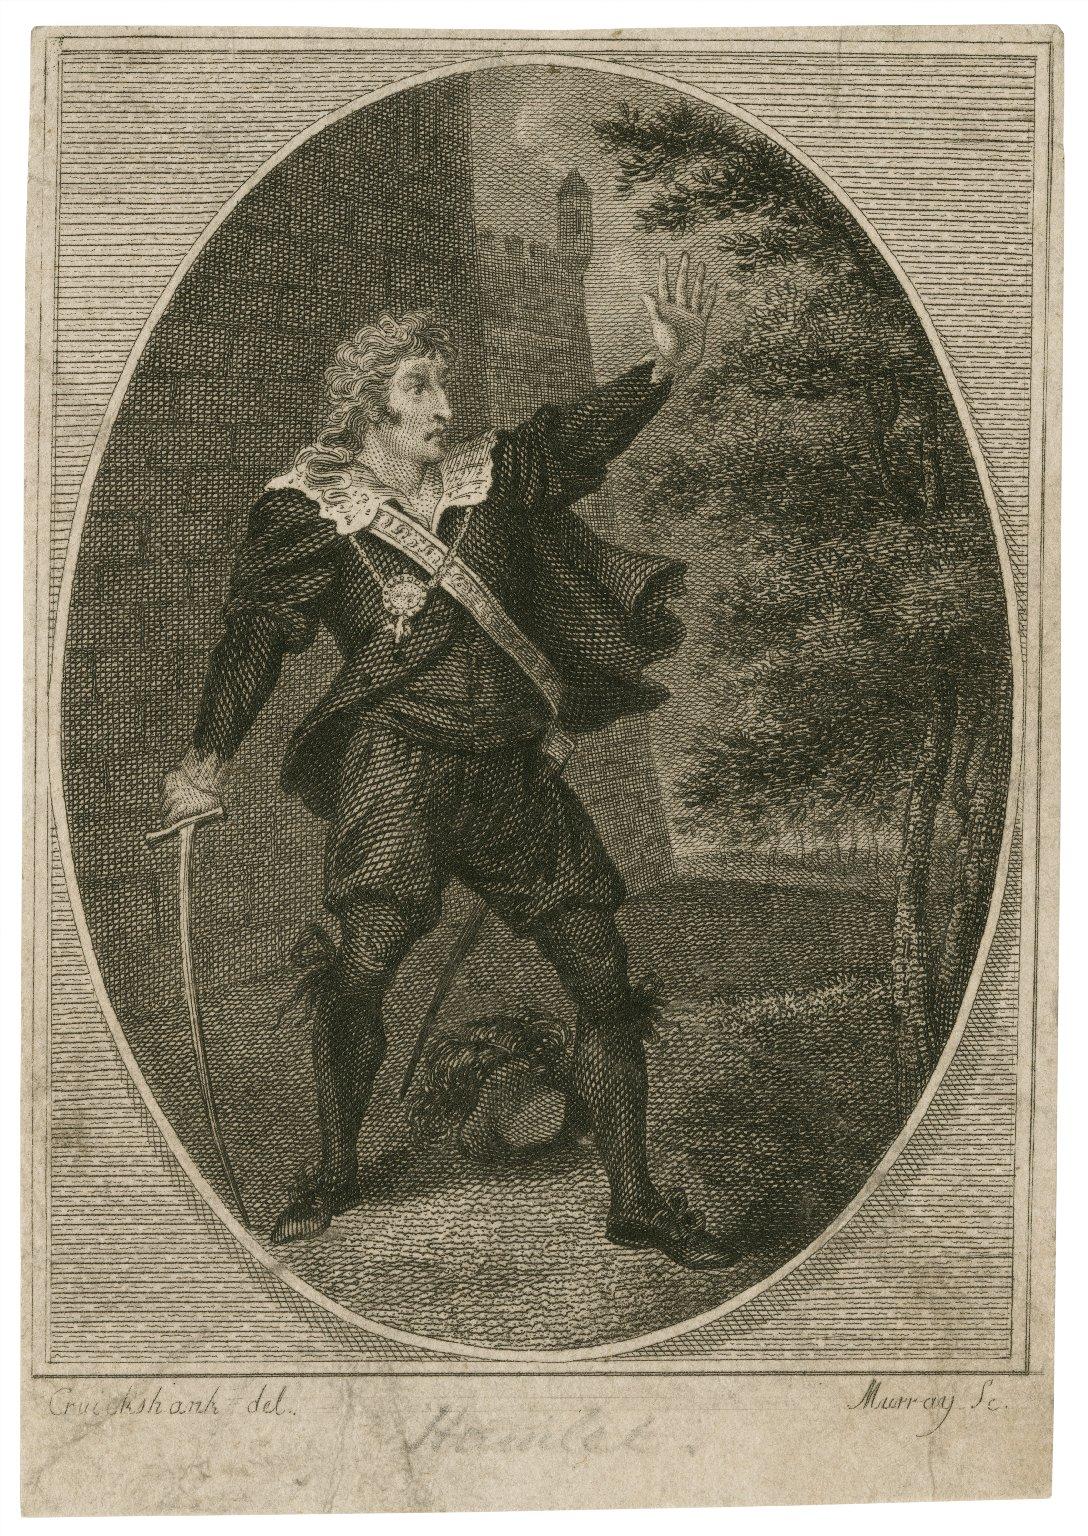 Mr. Kemble as Hamlet ... [in Shakespeare's Hamlet] [graphic] / Cruickshank [sic], del. ; Murray, sc.